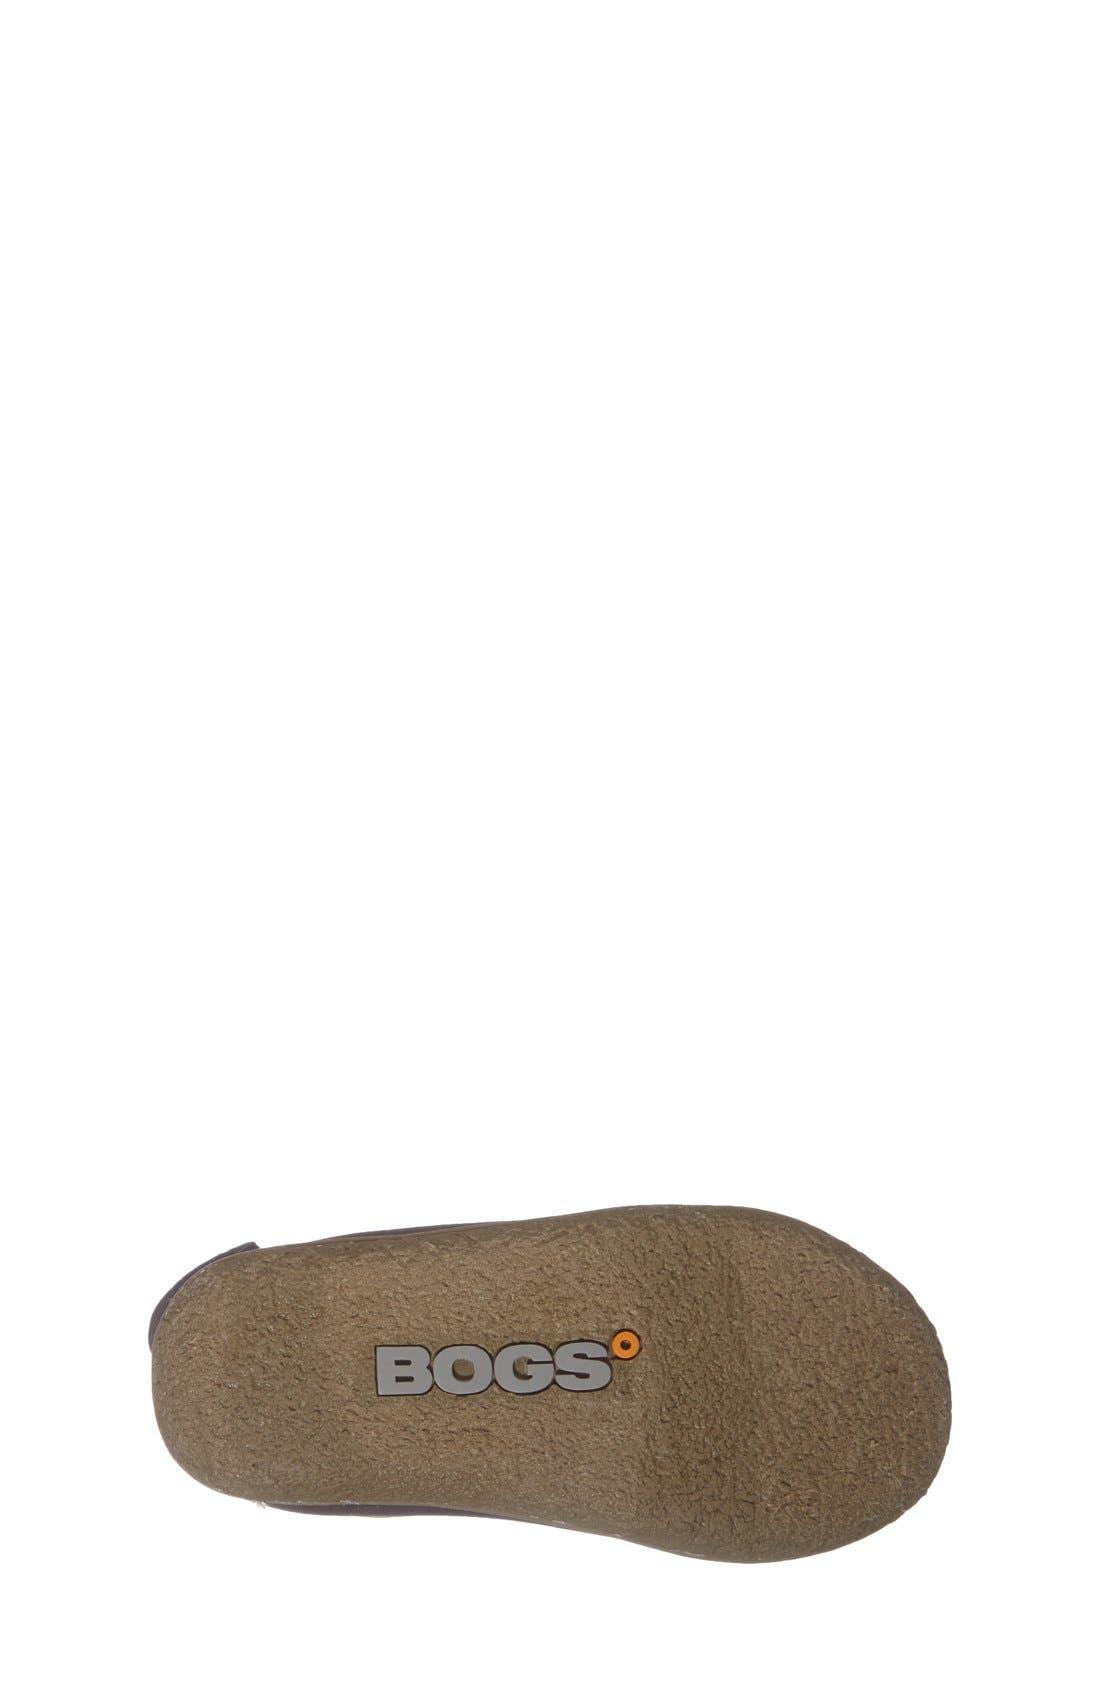 BOGS,                             Baby Bogs Insulated Waterproof Rain Boot,                             Alternate thumbnail 4, color,                             BLACK